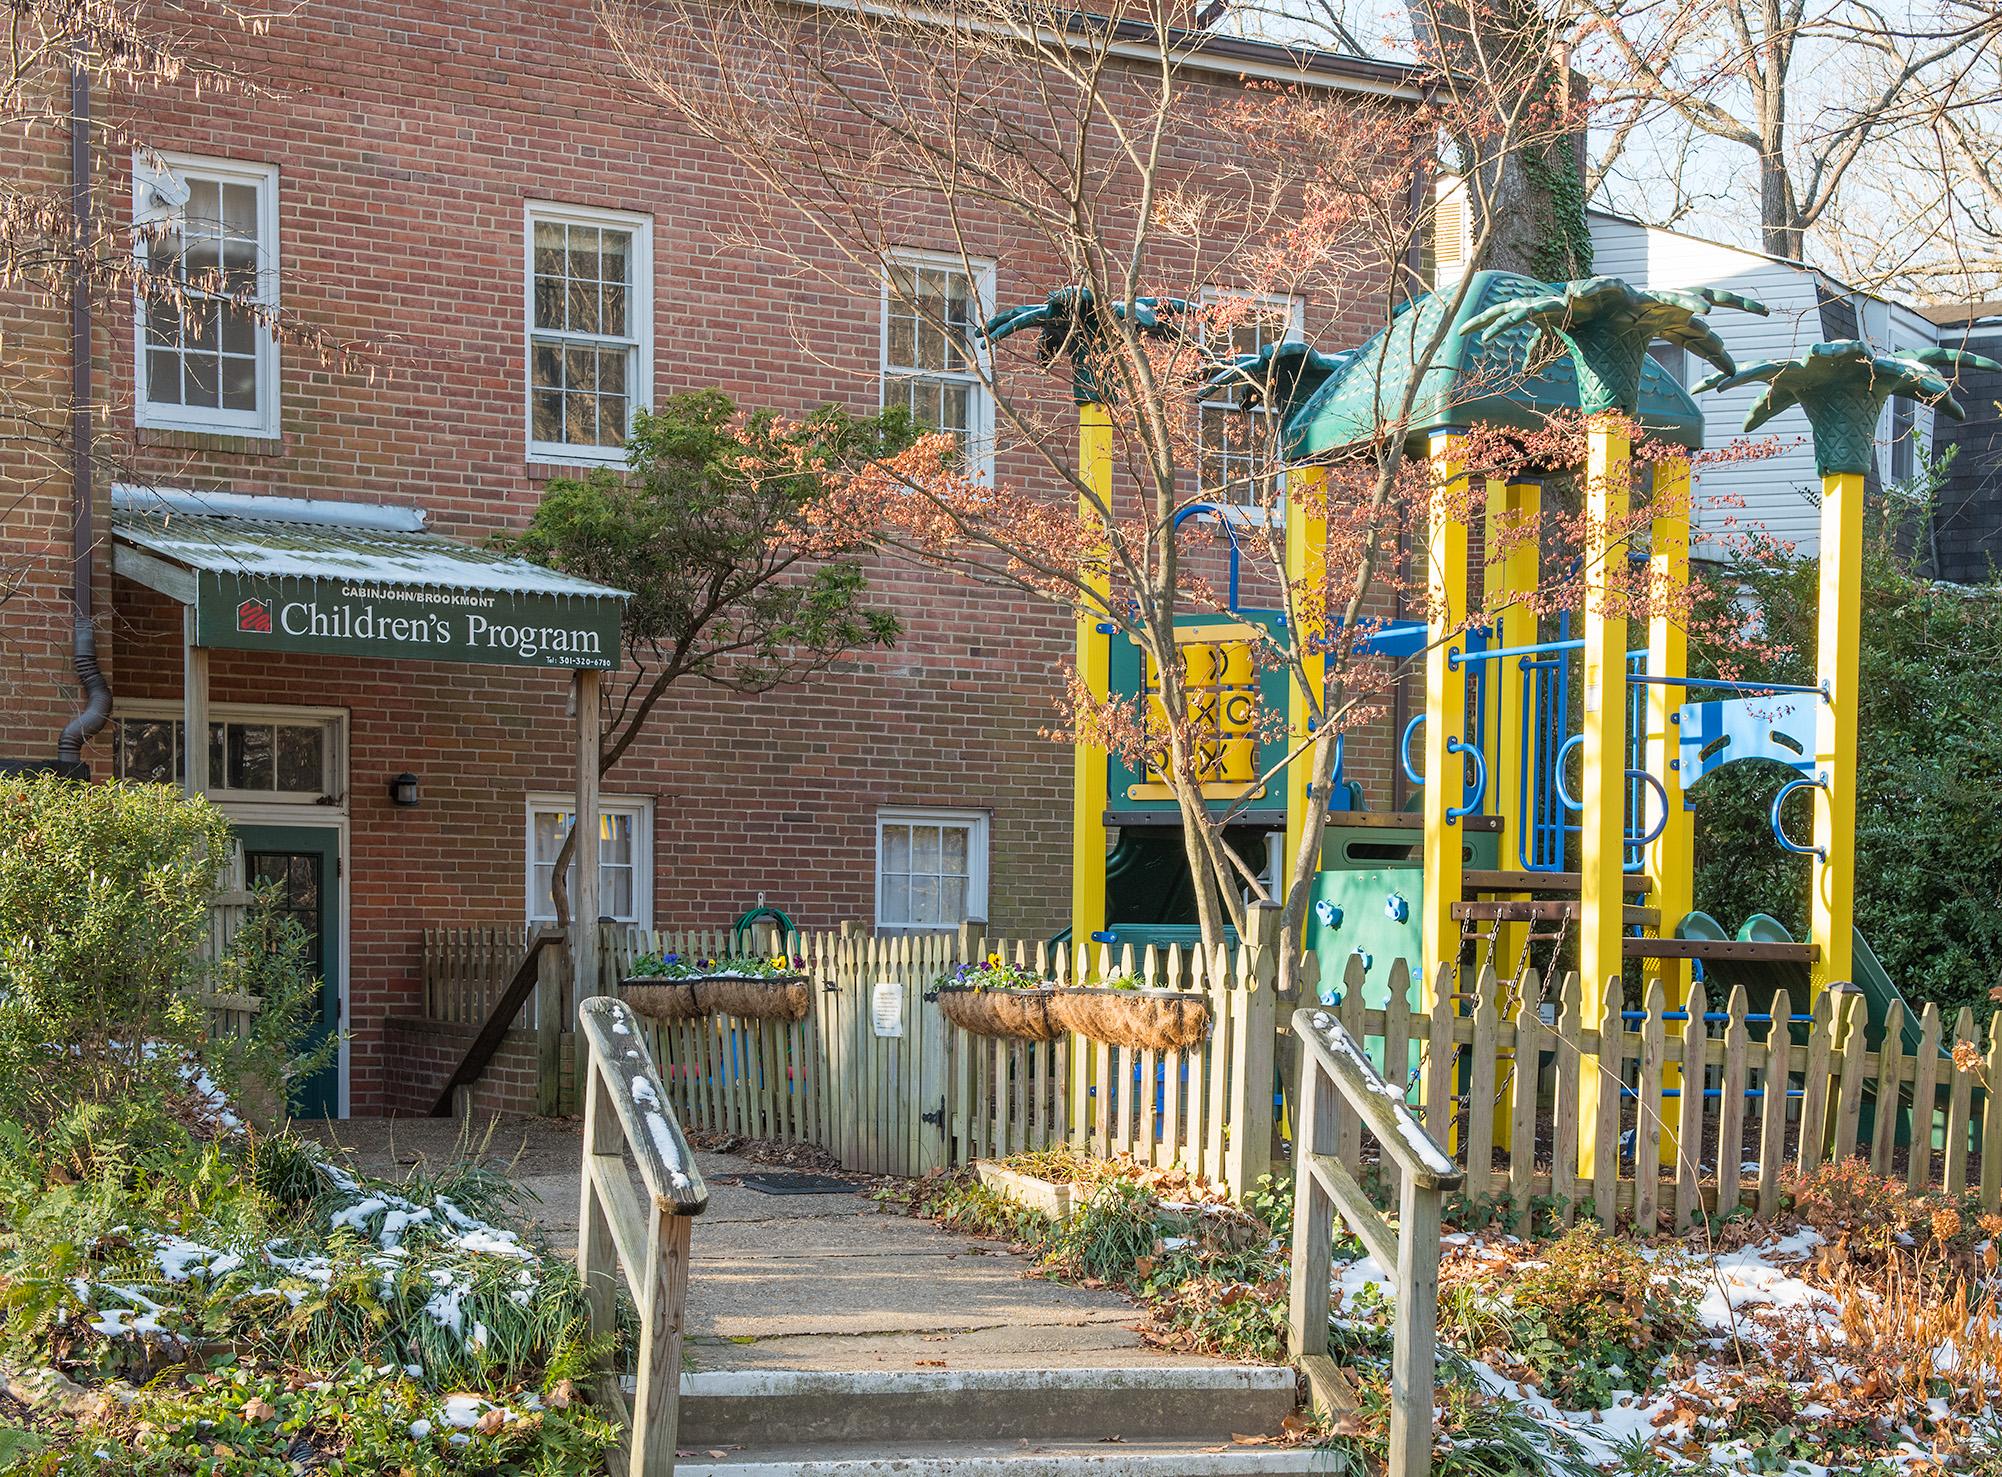 Cabin John Brookmont Preschool - Playground